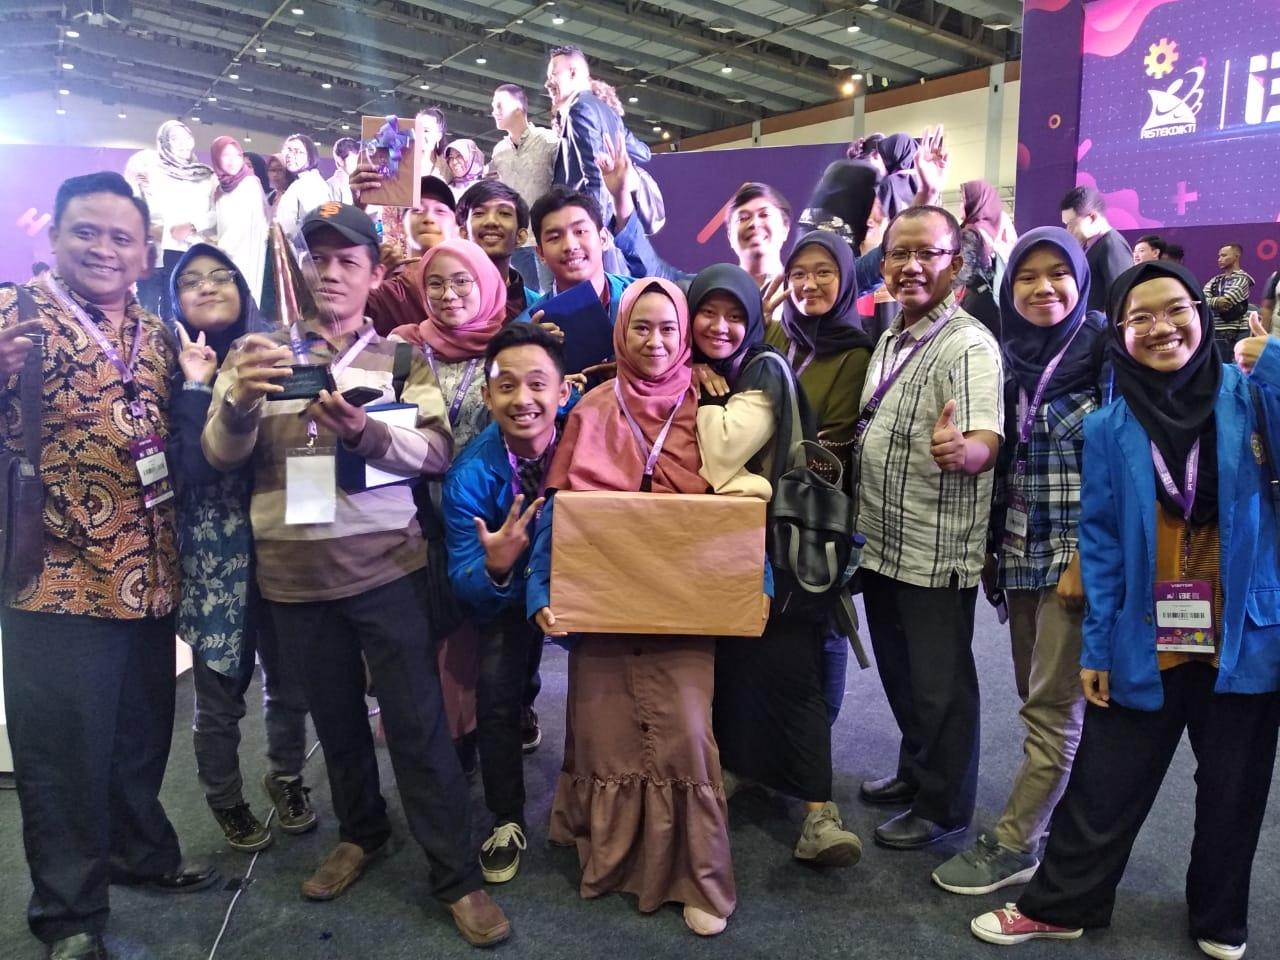 Ubah Pipis Sapi Jadi Pupuk Organik, Mahasiswa Unpam Juarai Kompetisi Inovasi Inovator Indonesia Ekspo (I3E) 2019 Ristekdikti